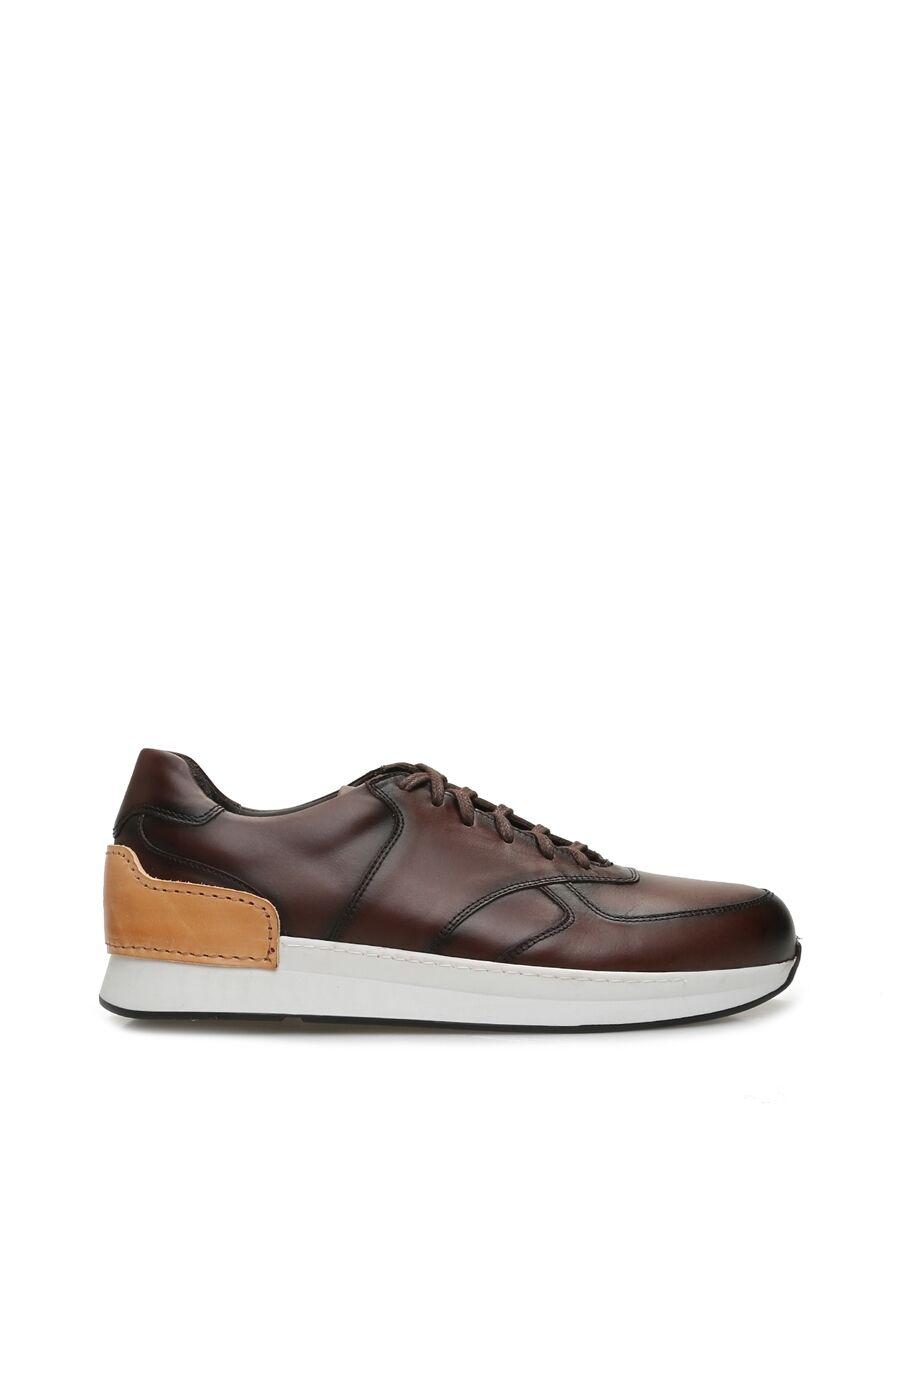 Kahverengi Taban Detaylı Erkek Deri Sneaker